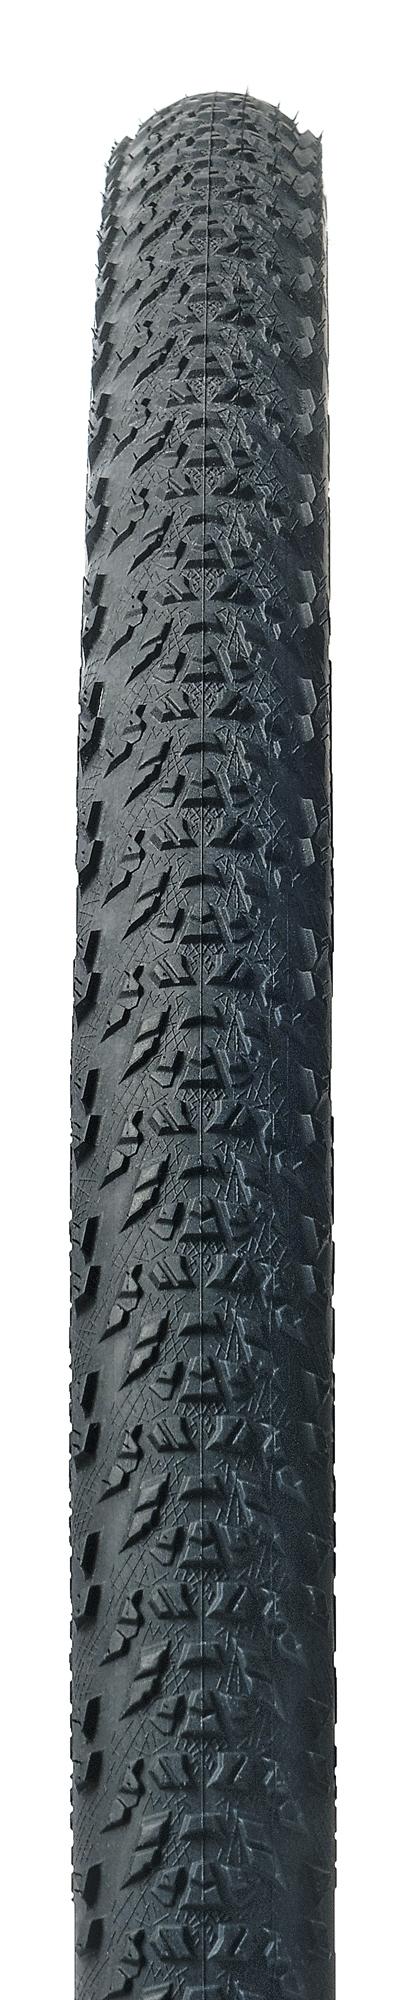 plášť HUTCH. BLACK MAMBA CX 700x34 TLR kevlar,črn.